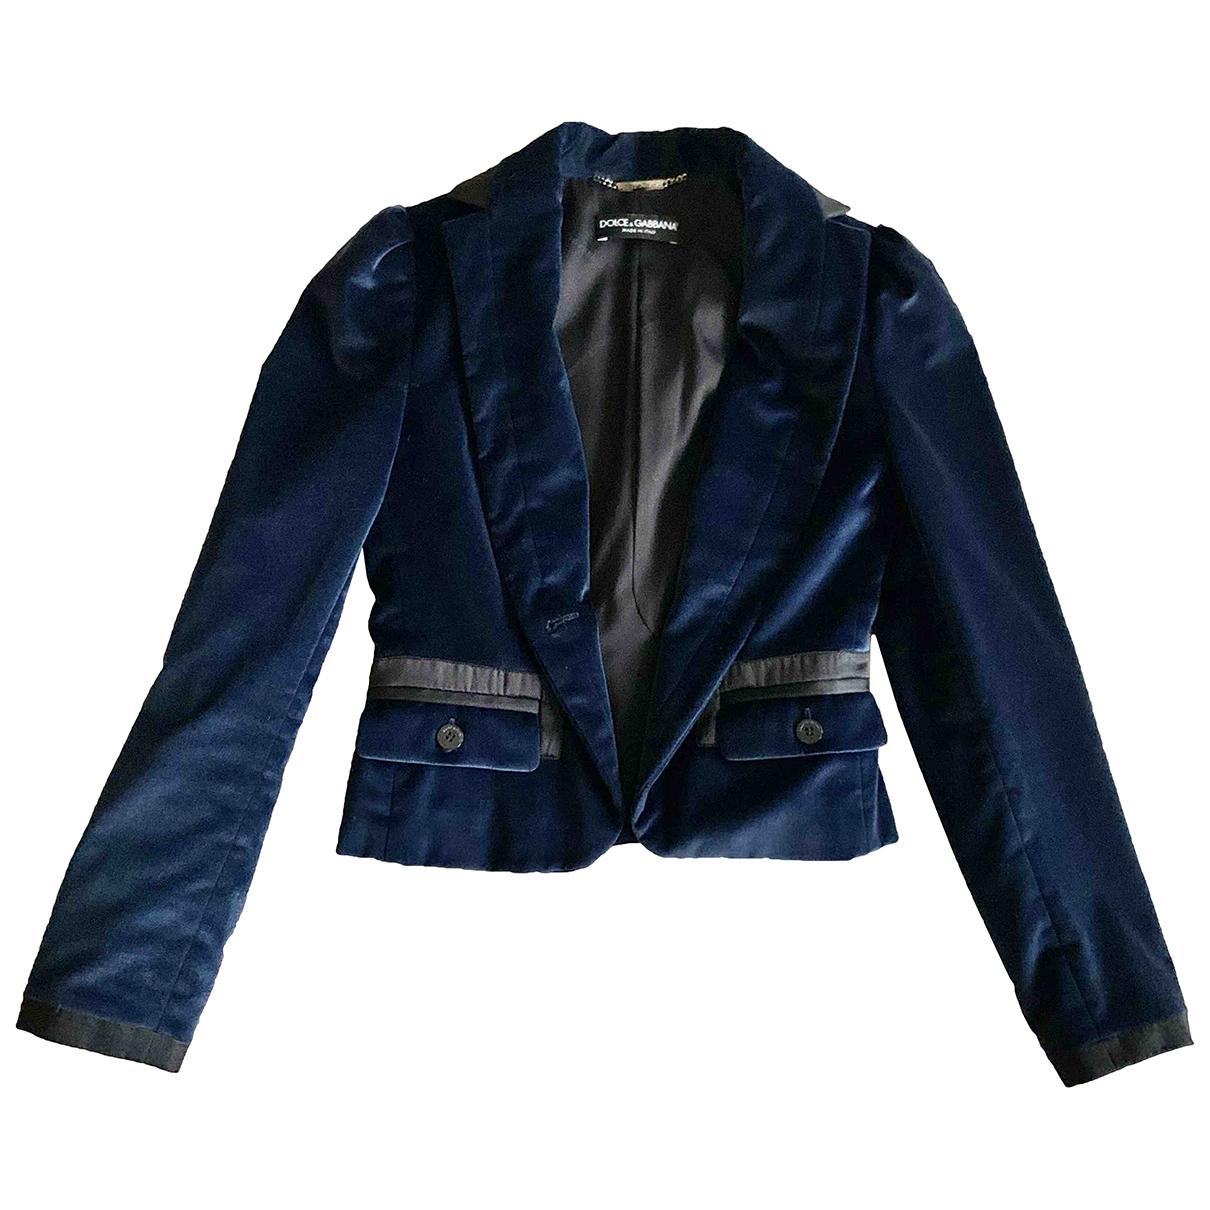 Dolce & Gabbana \N Jacke in  Marine Baumwolle